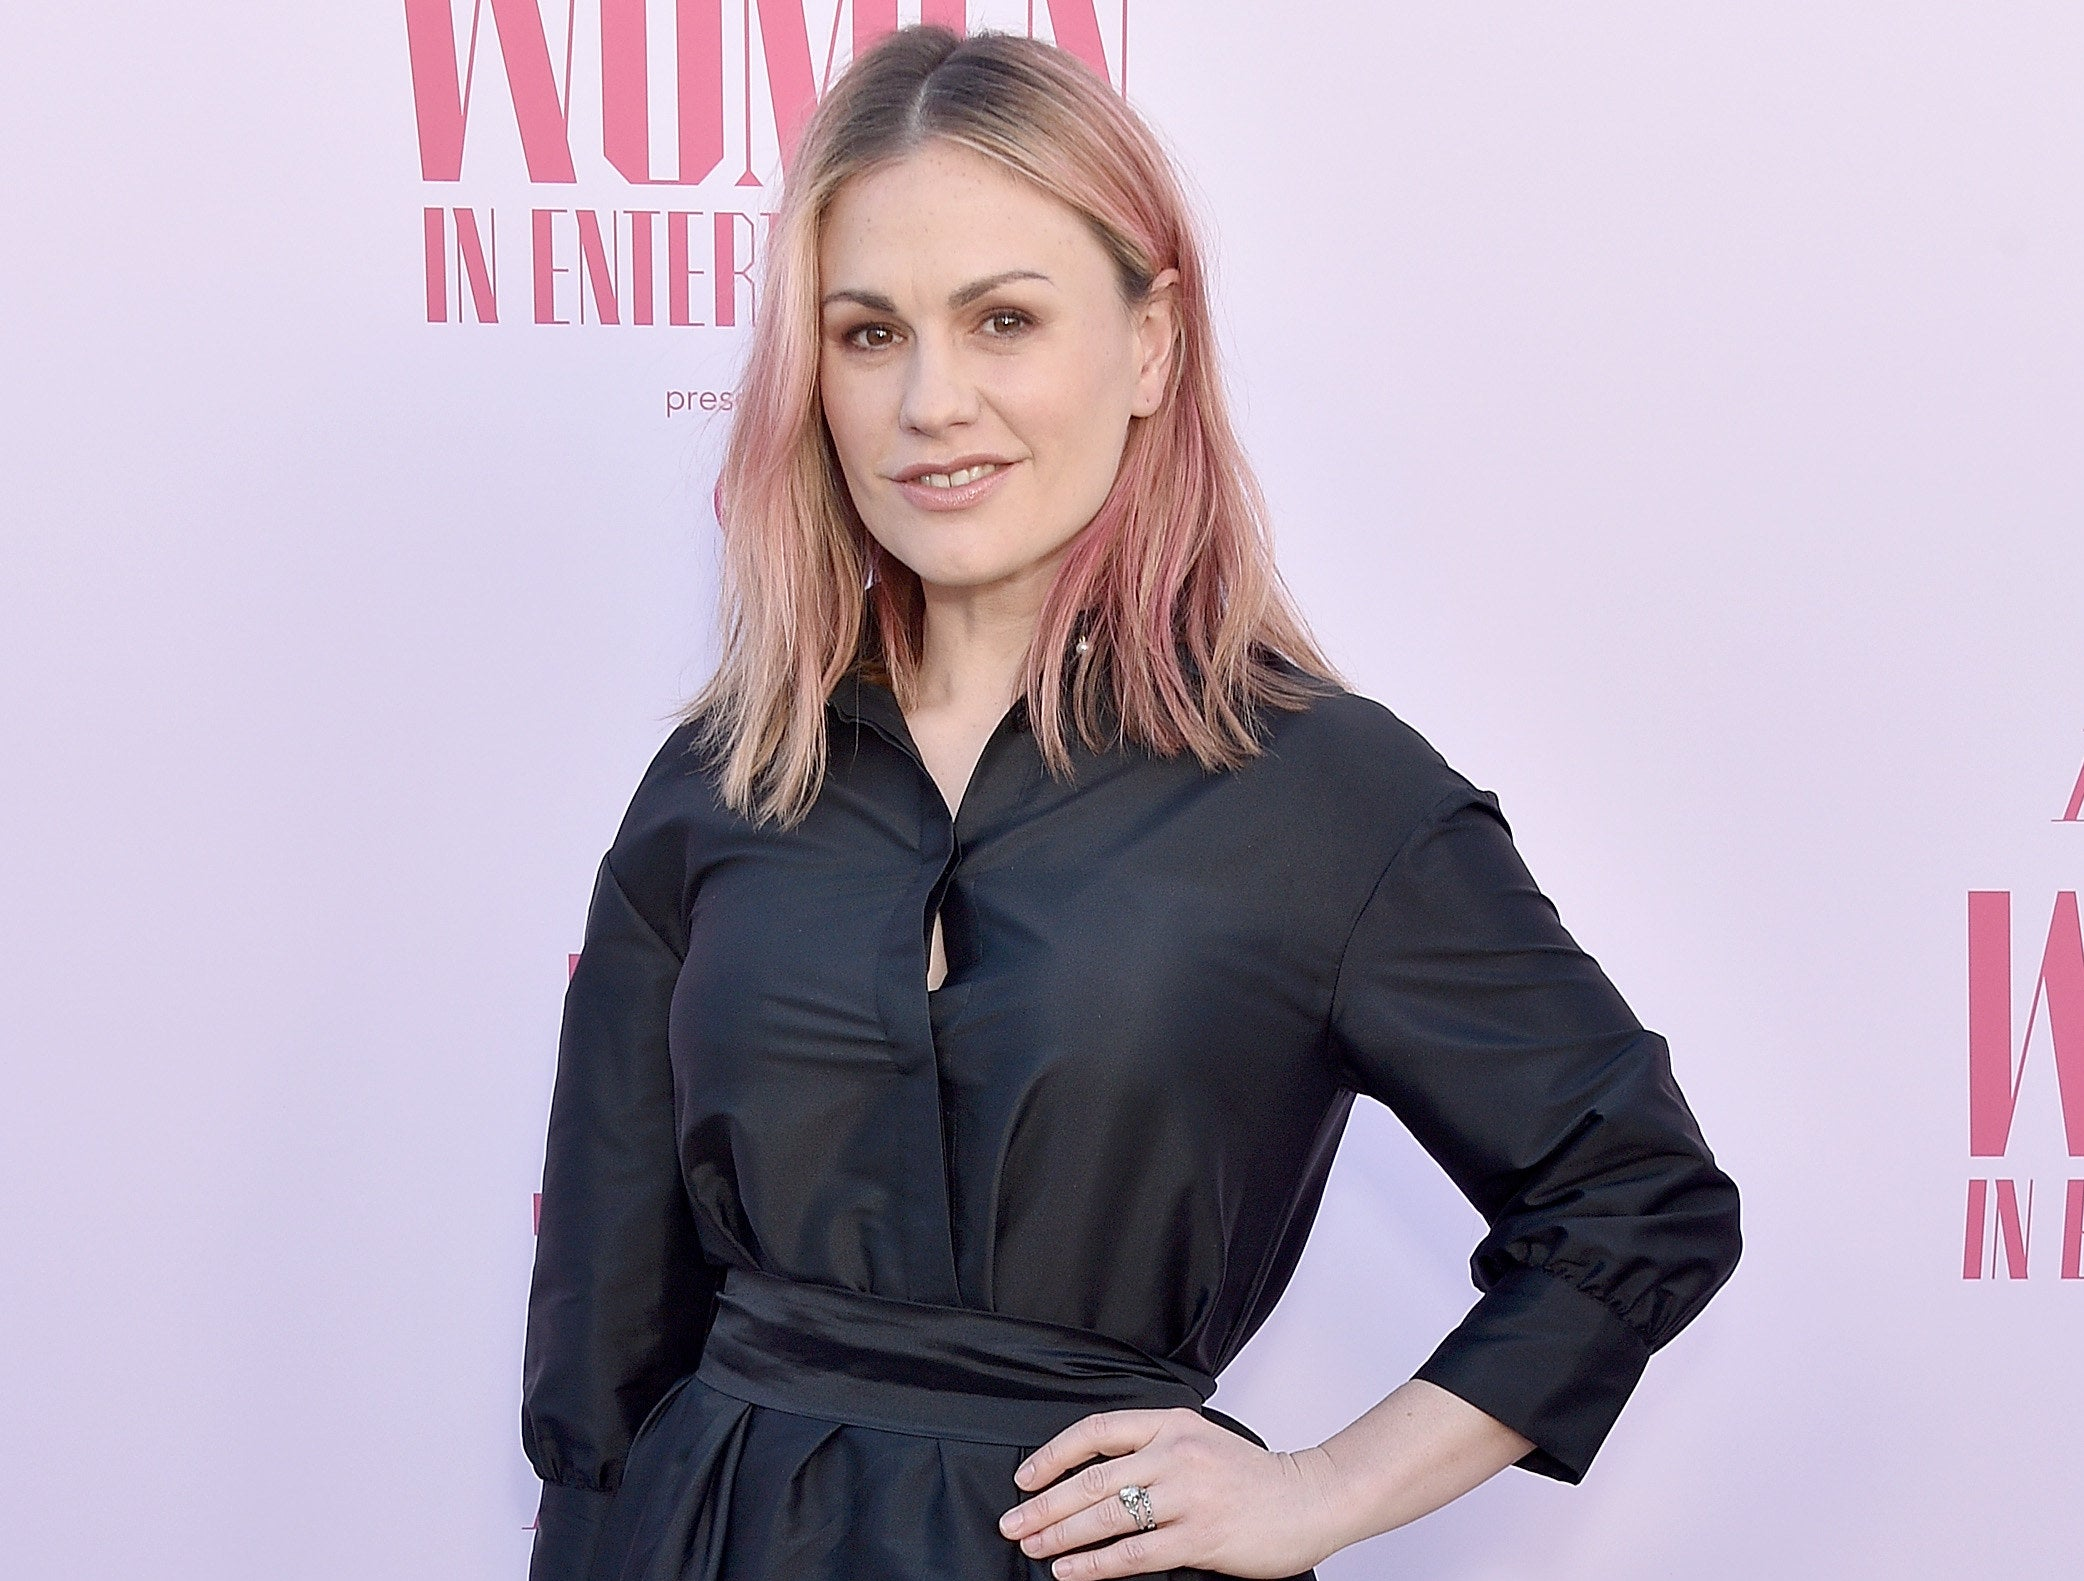 Anna attends an event with light pink hair